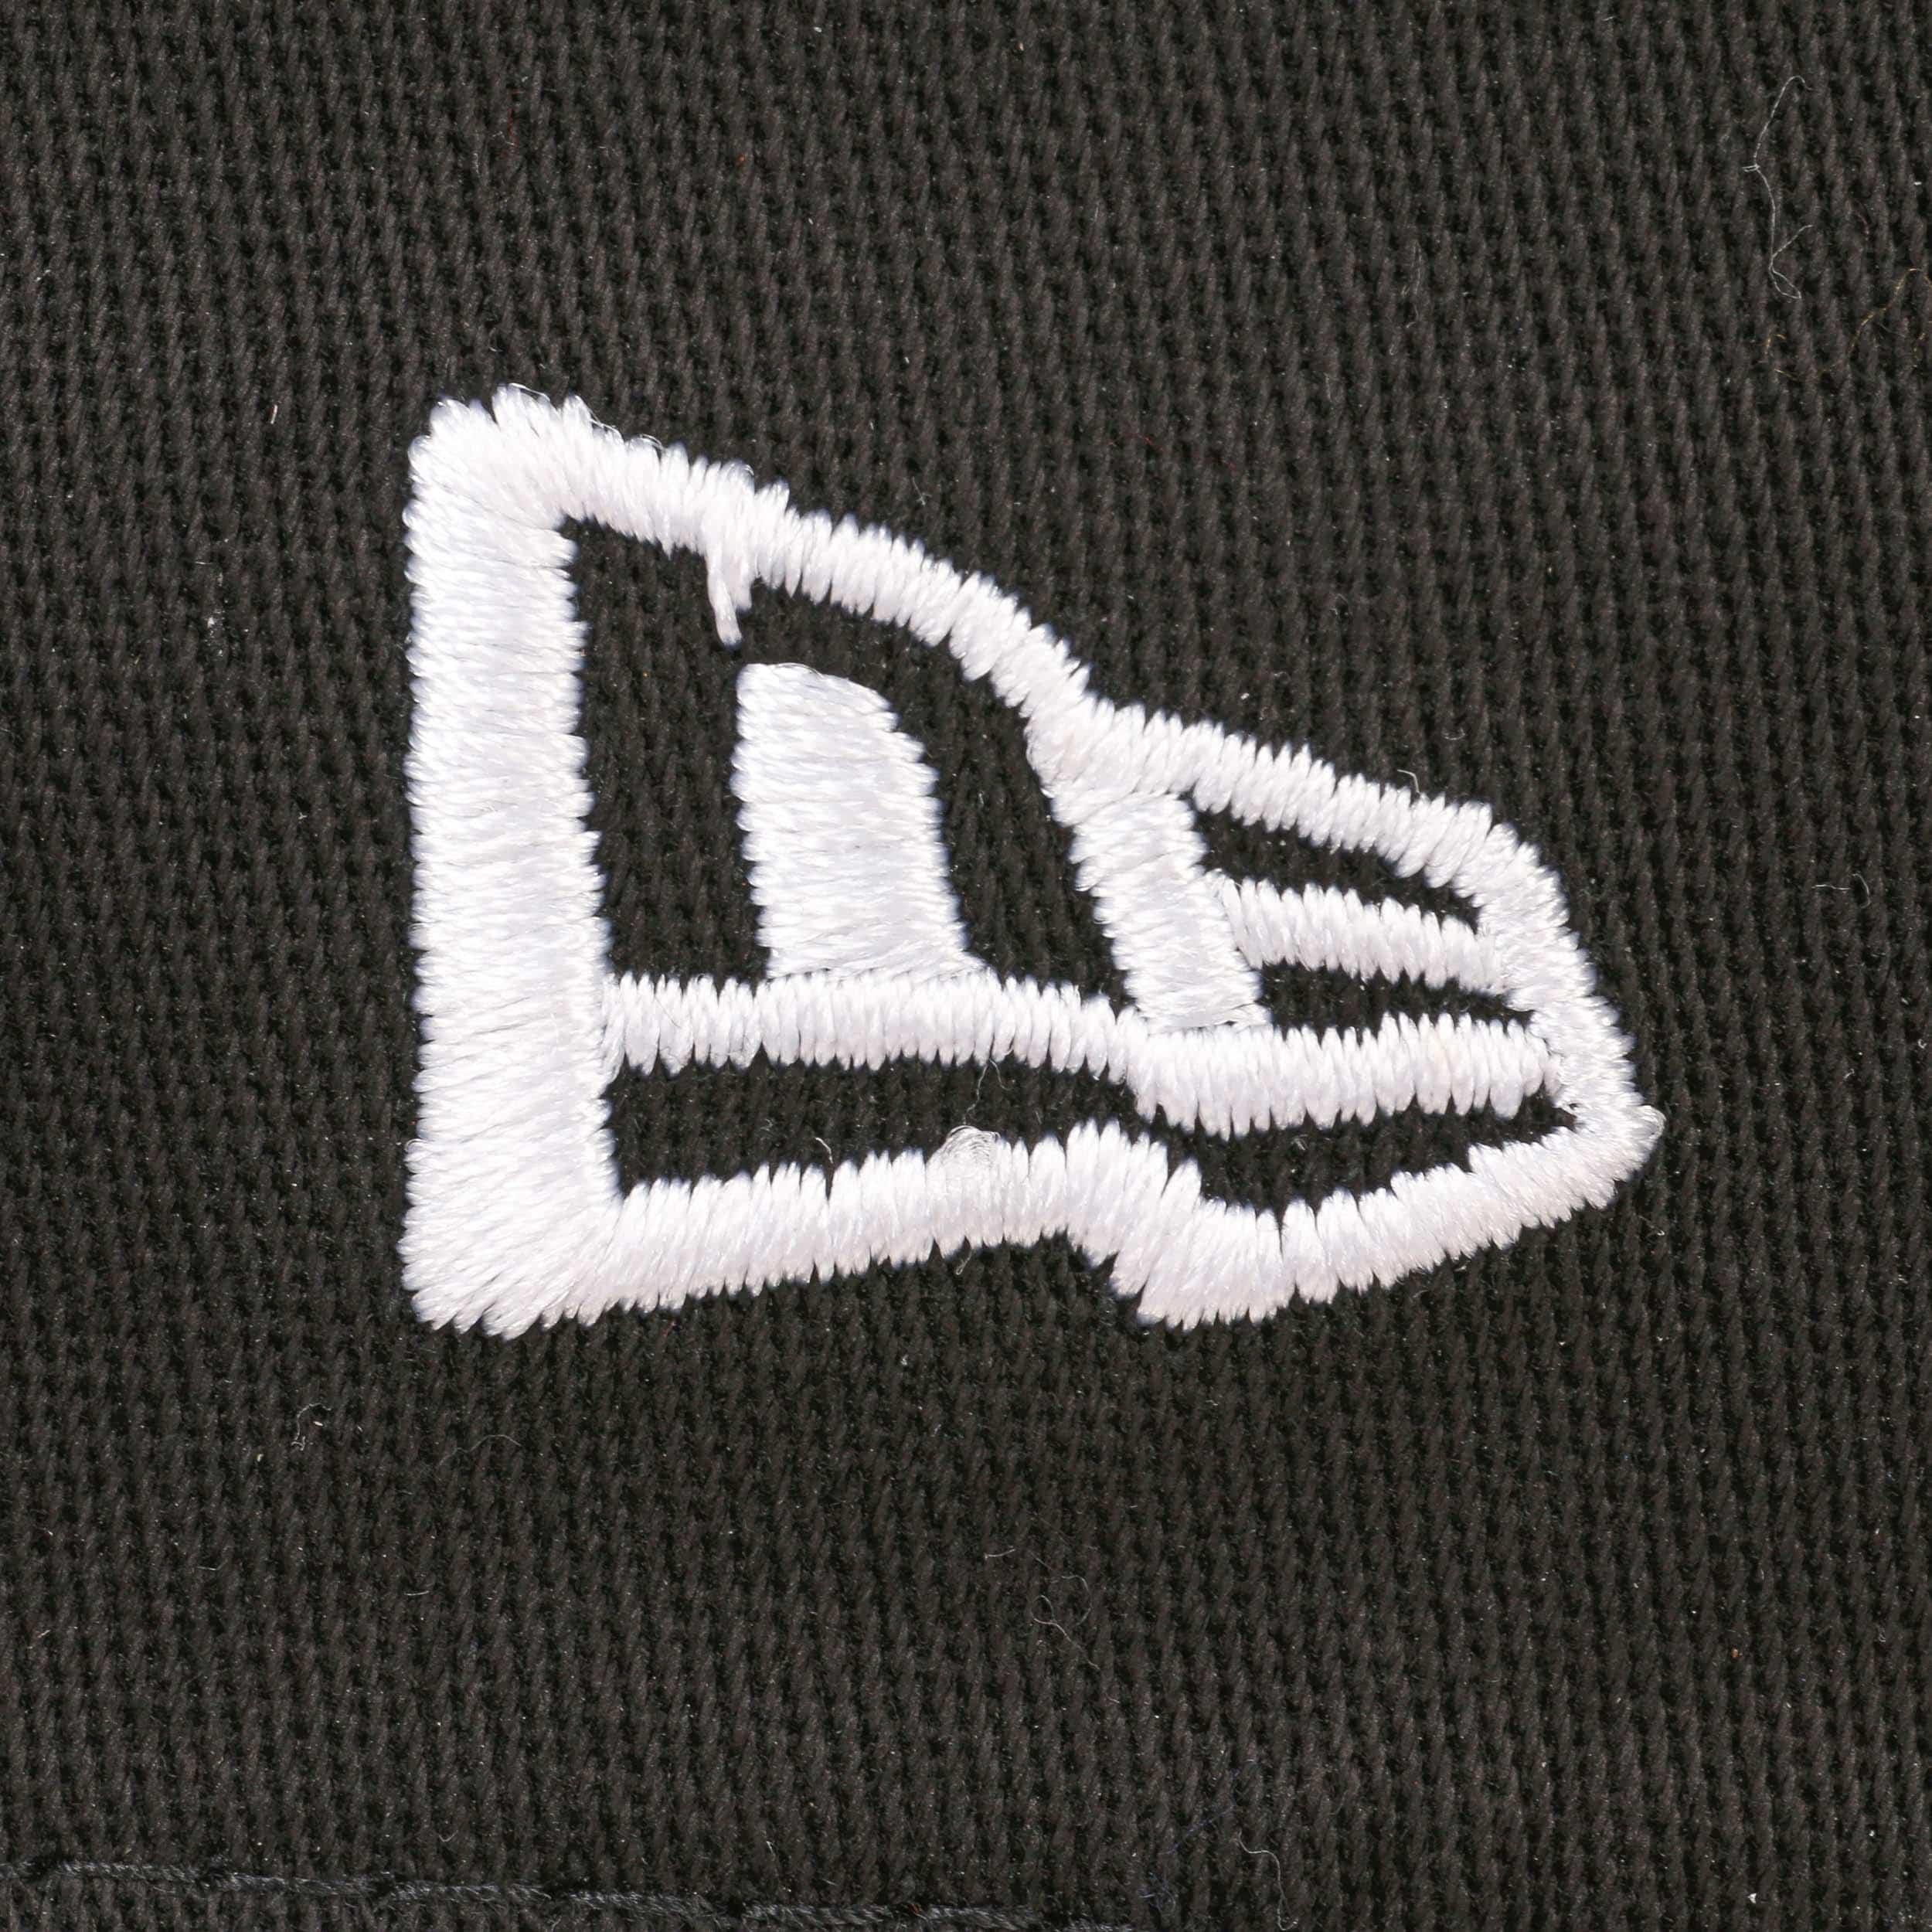 ... 39Thirty Black Base Seahawks Cap by New Era - black 5 ... f422784a9